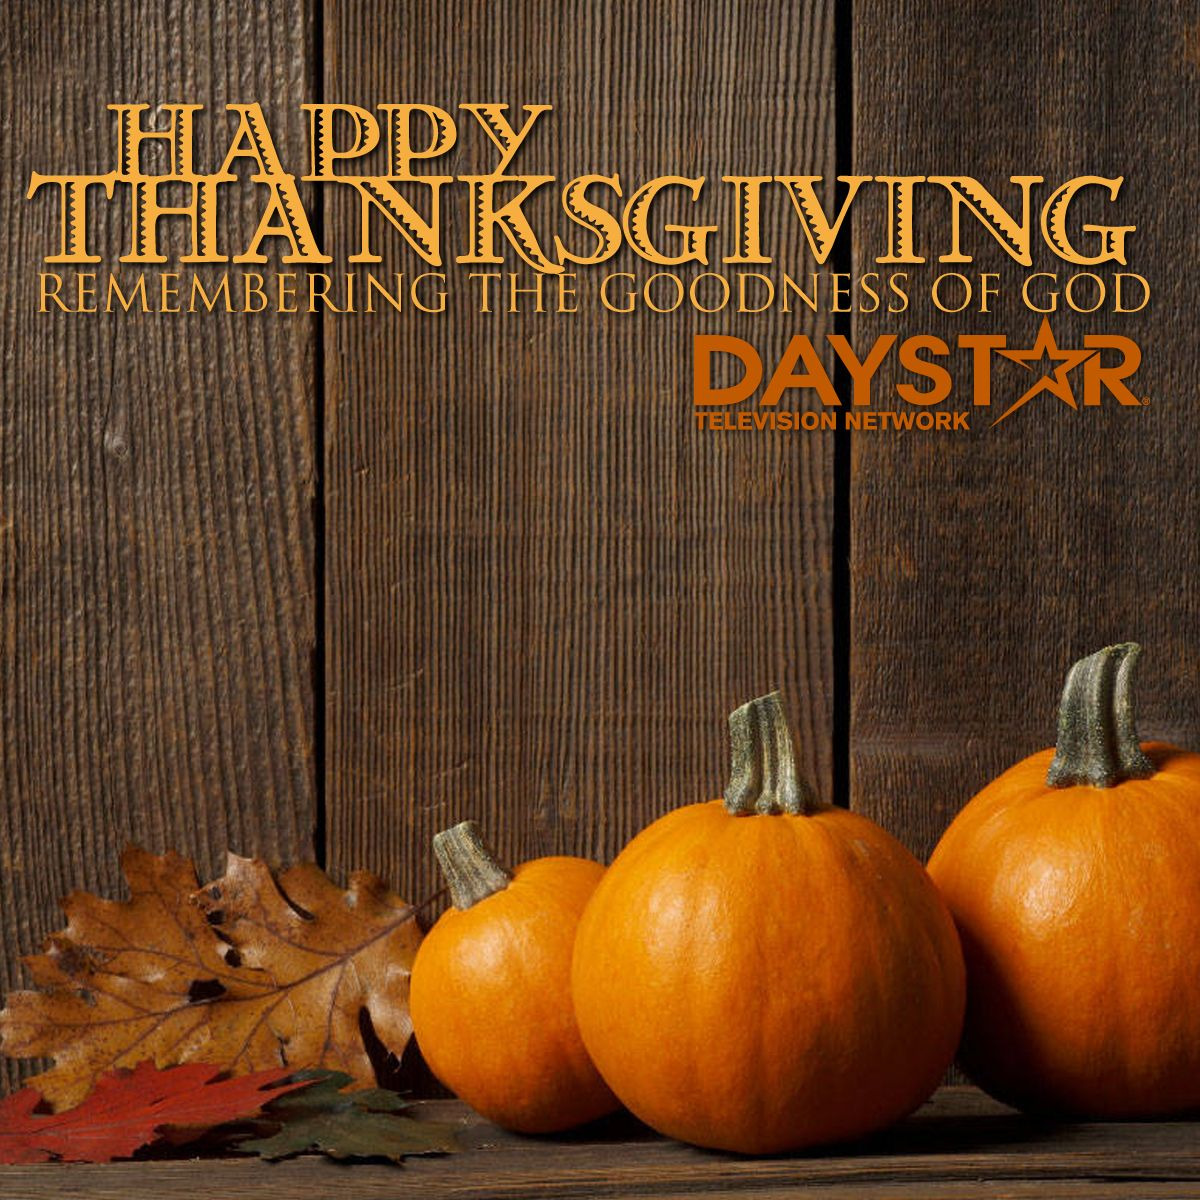 Happy Thanksgiving Daystar Com Thanksgiving Wallpaper Thanksgiving Background Thanksgiving Facebook Covers